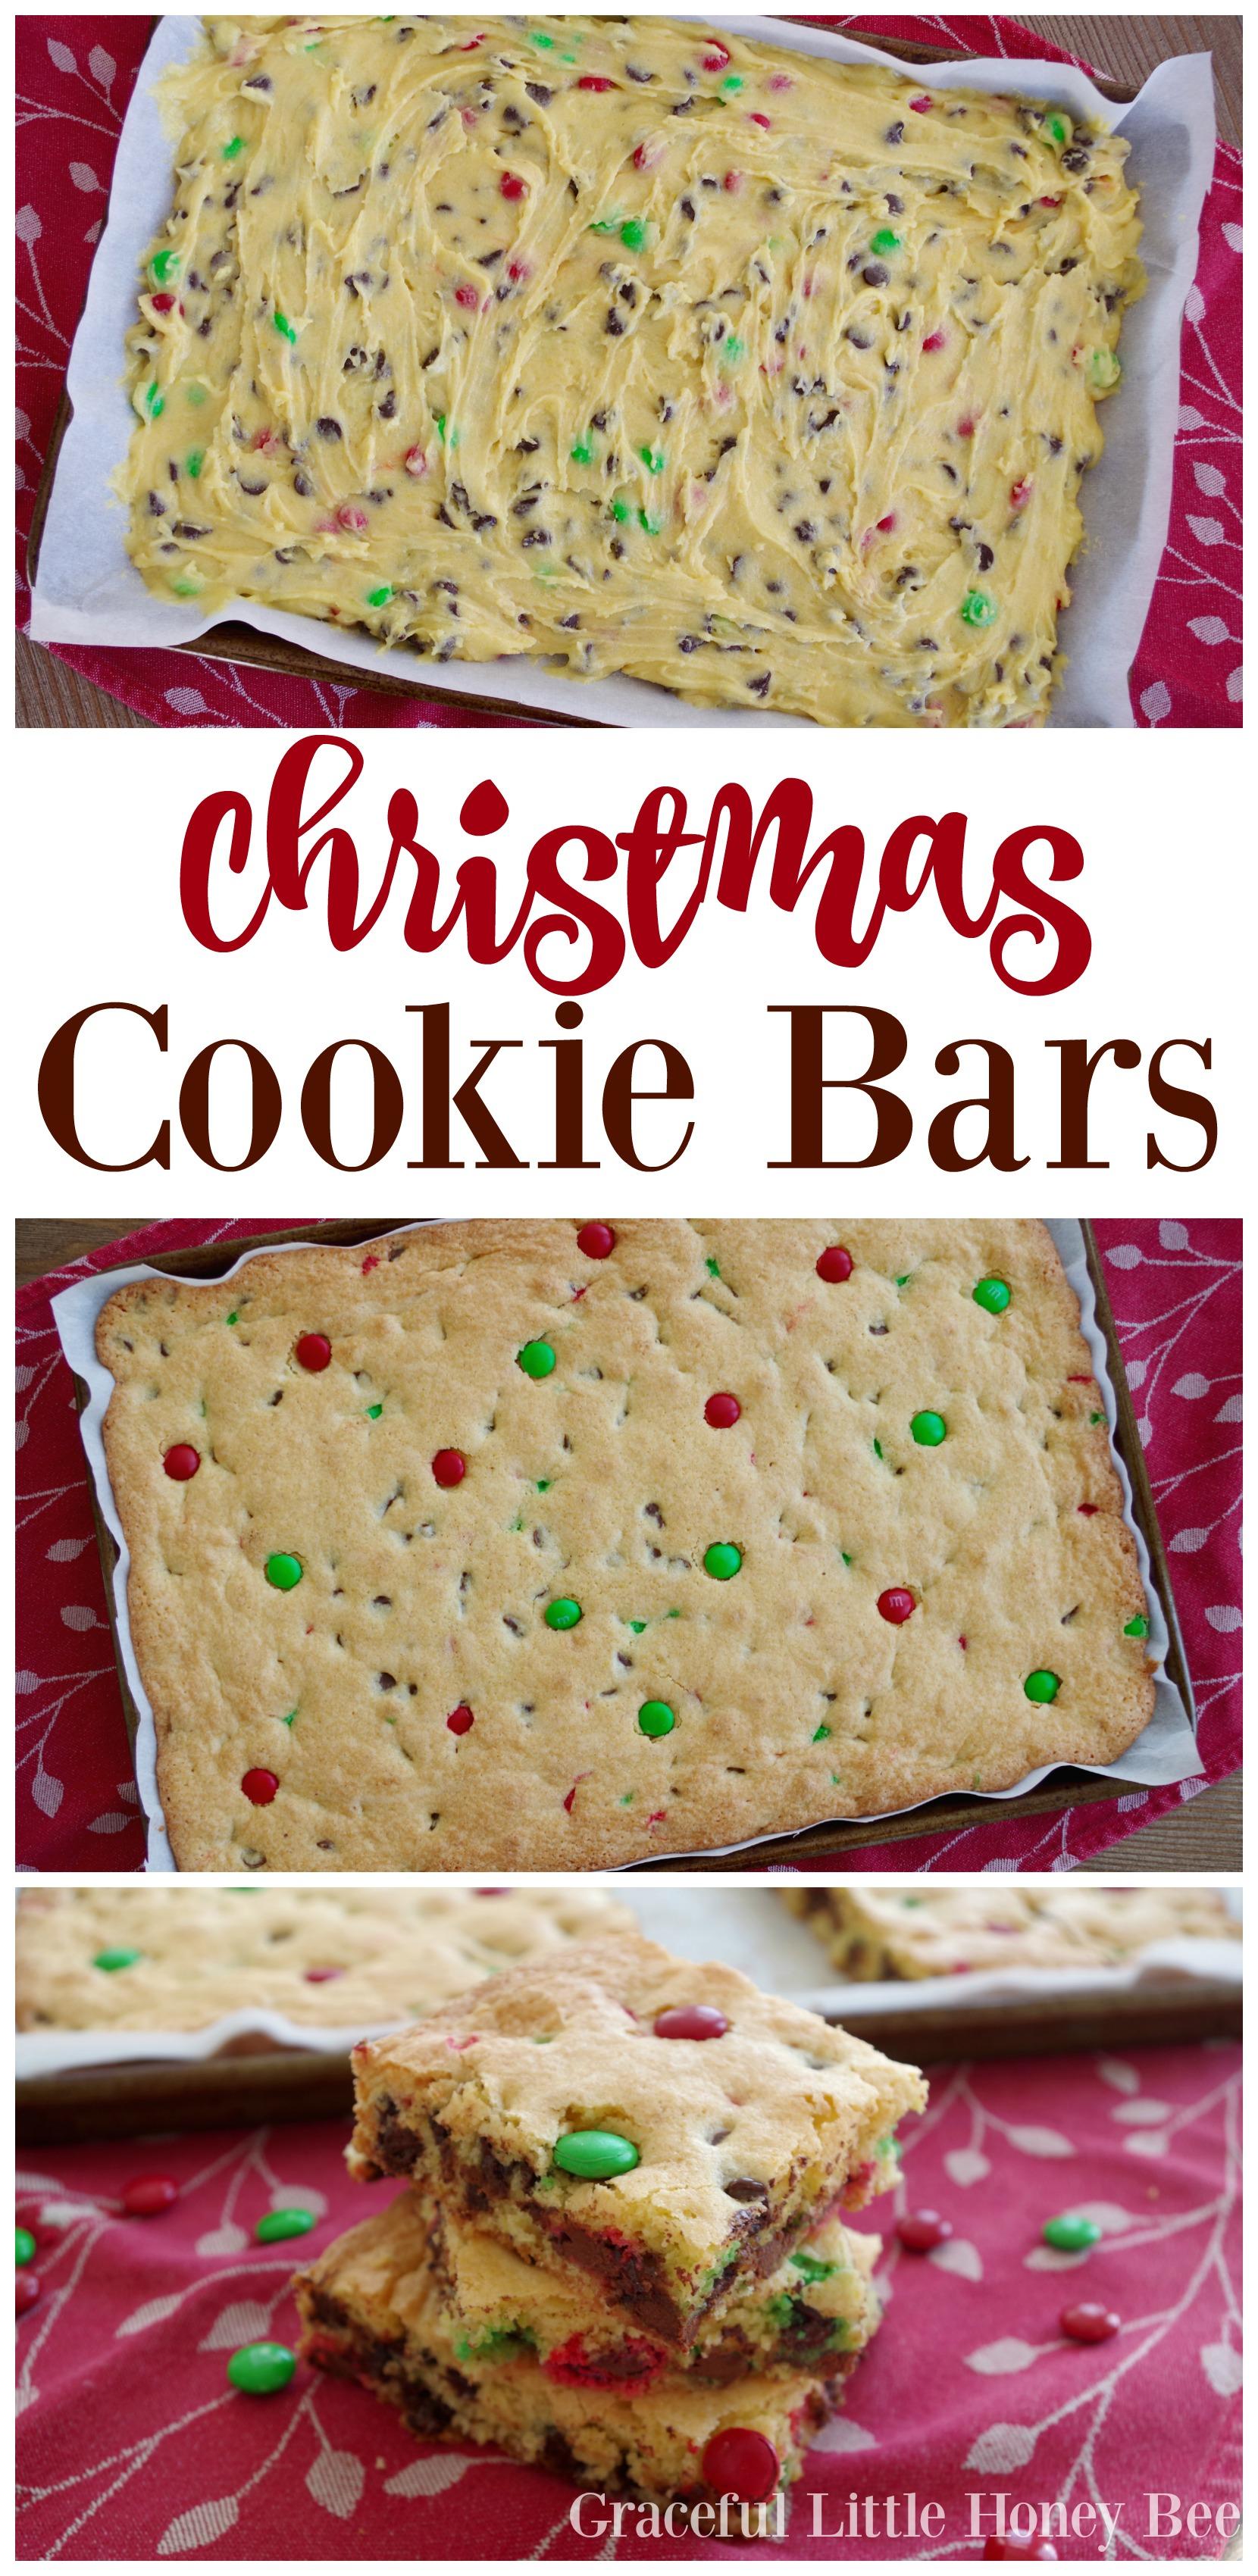 Christmas Cookie Bars - Graceful Little Honey Bee